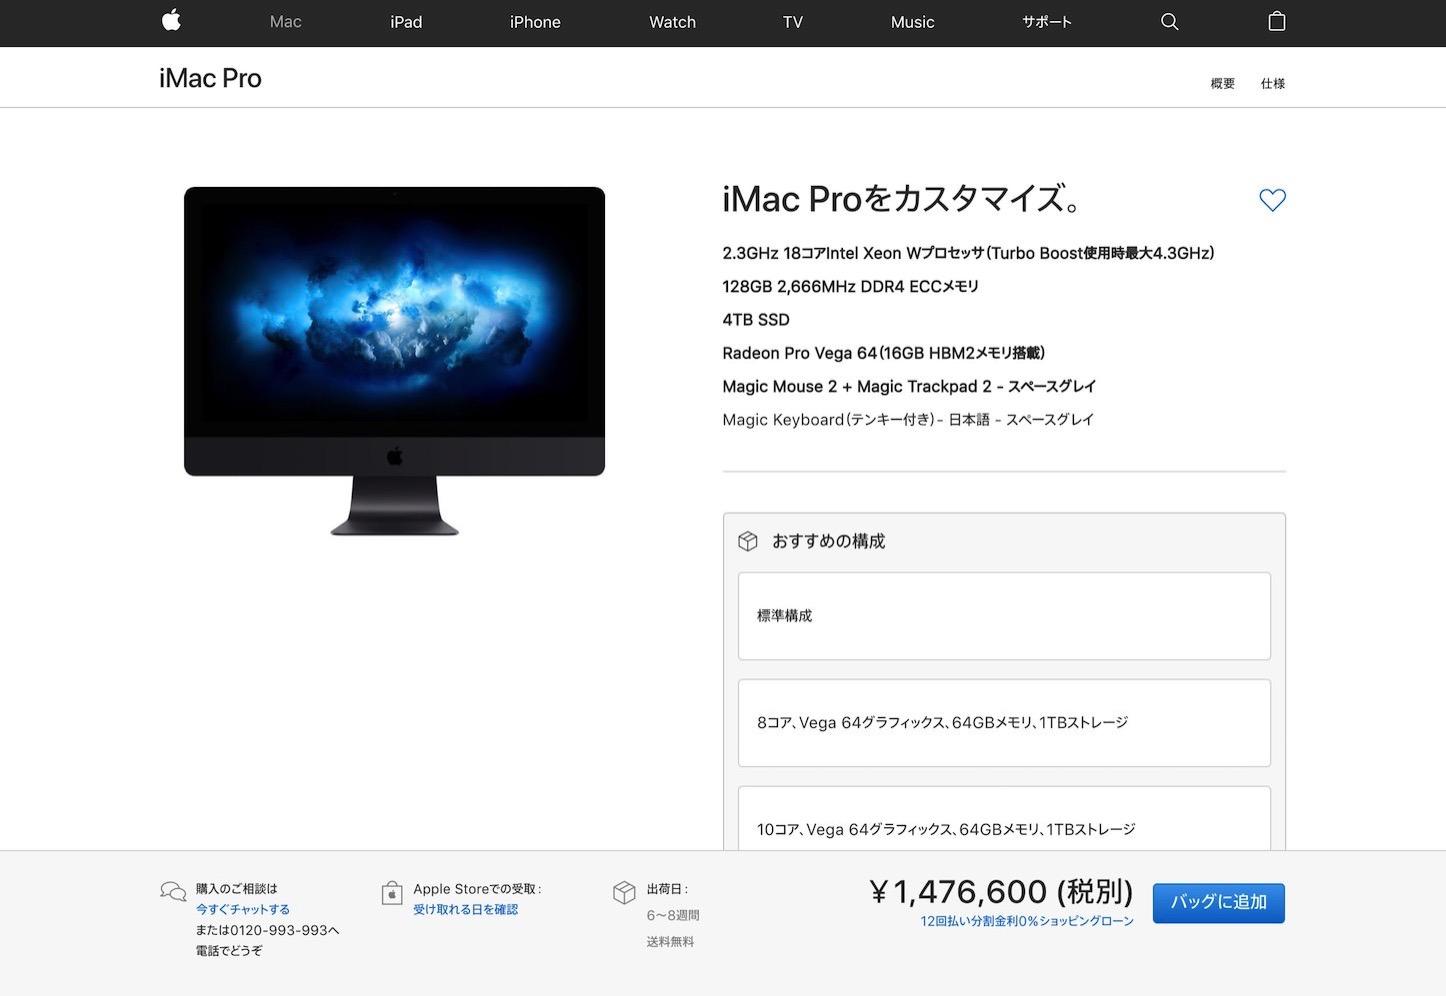 iMac-Pro-Max-Spec.jpg